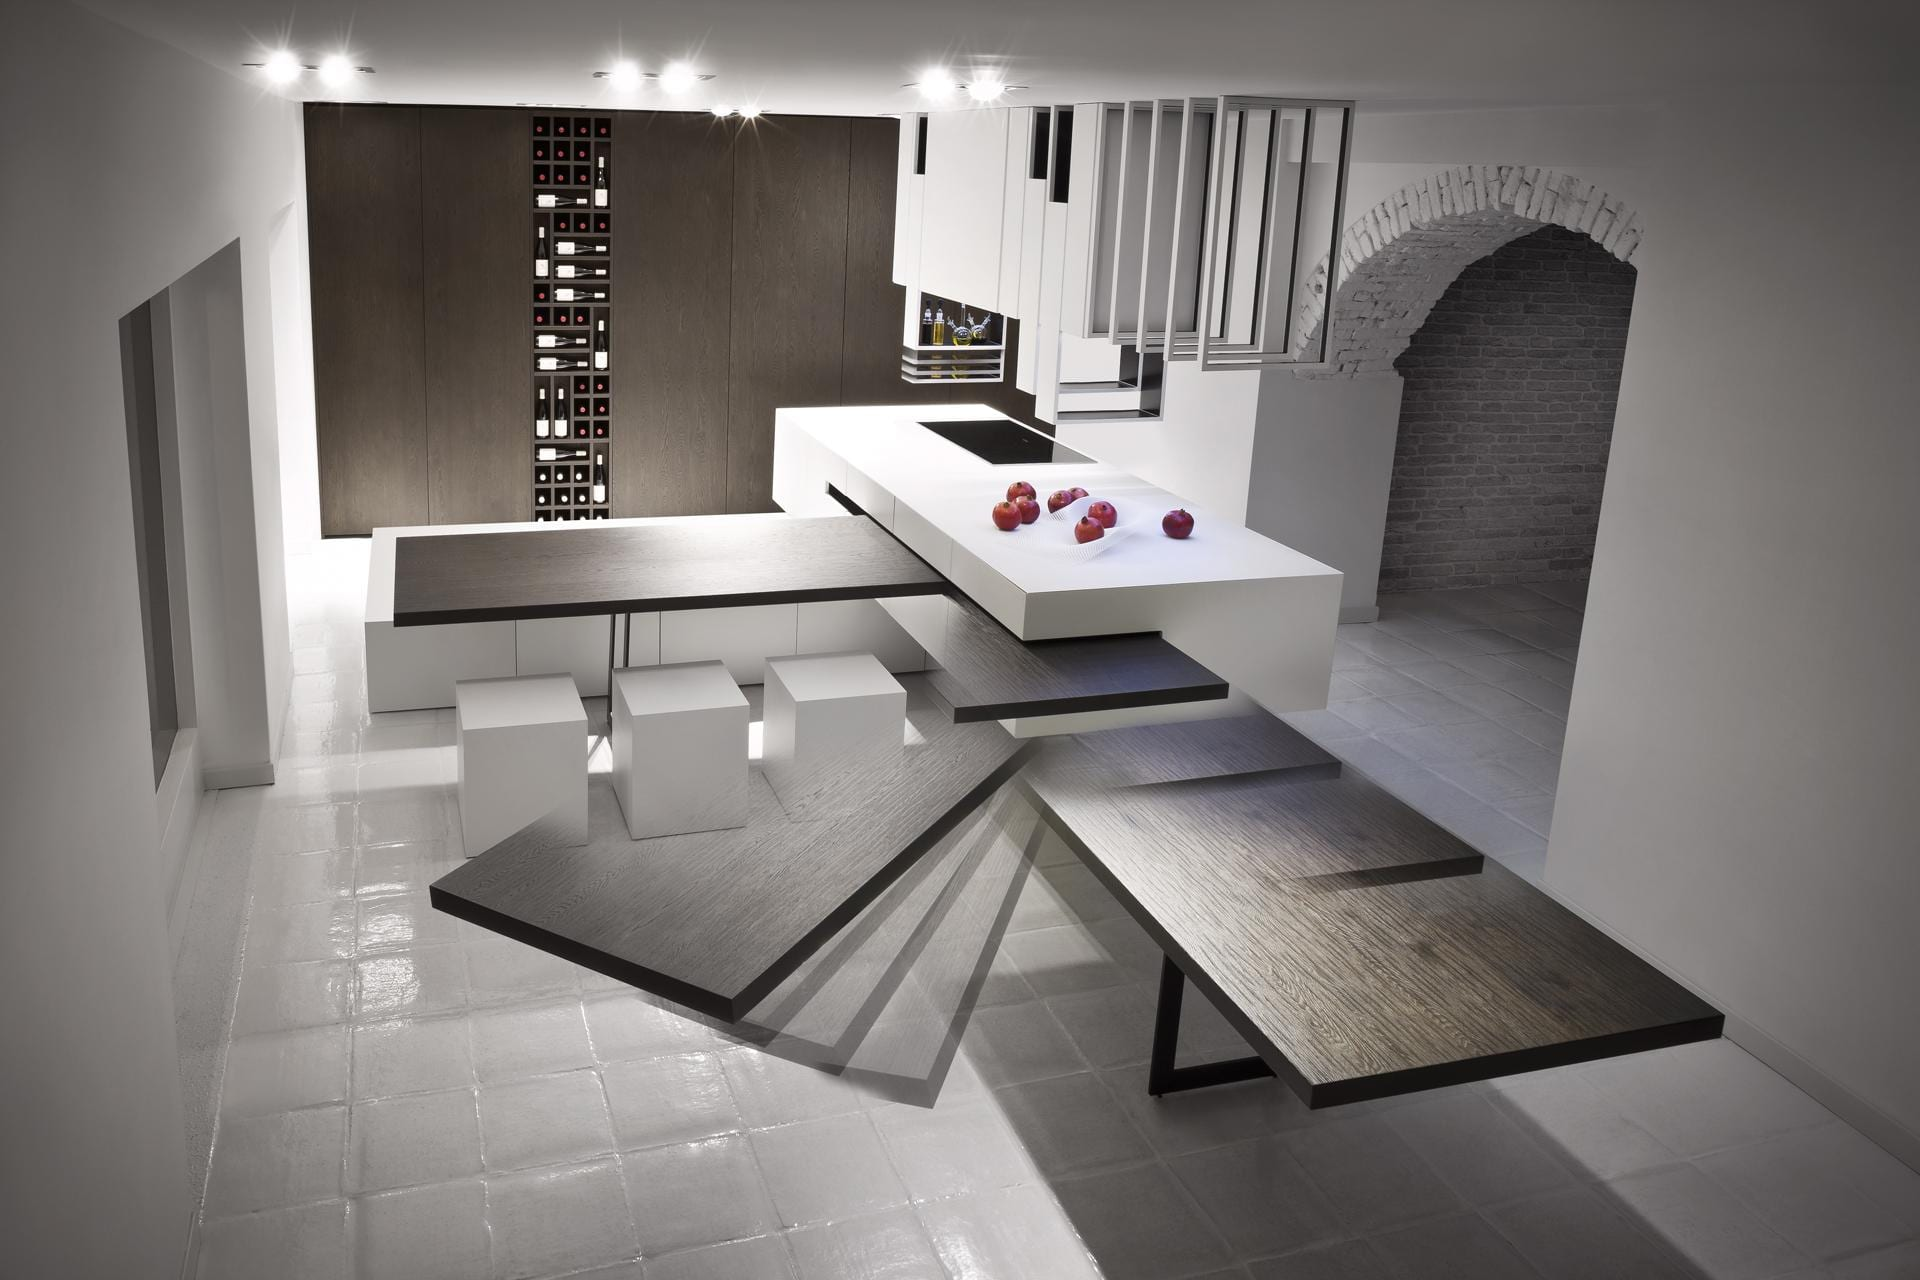 moderne k che wei mit kochinsel und mobiler. Black Bedroom Furniture Sets. Home Design Ideas